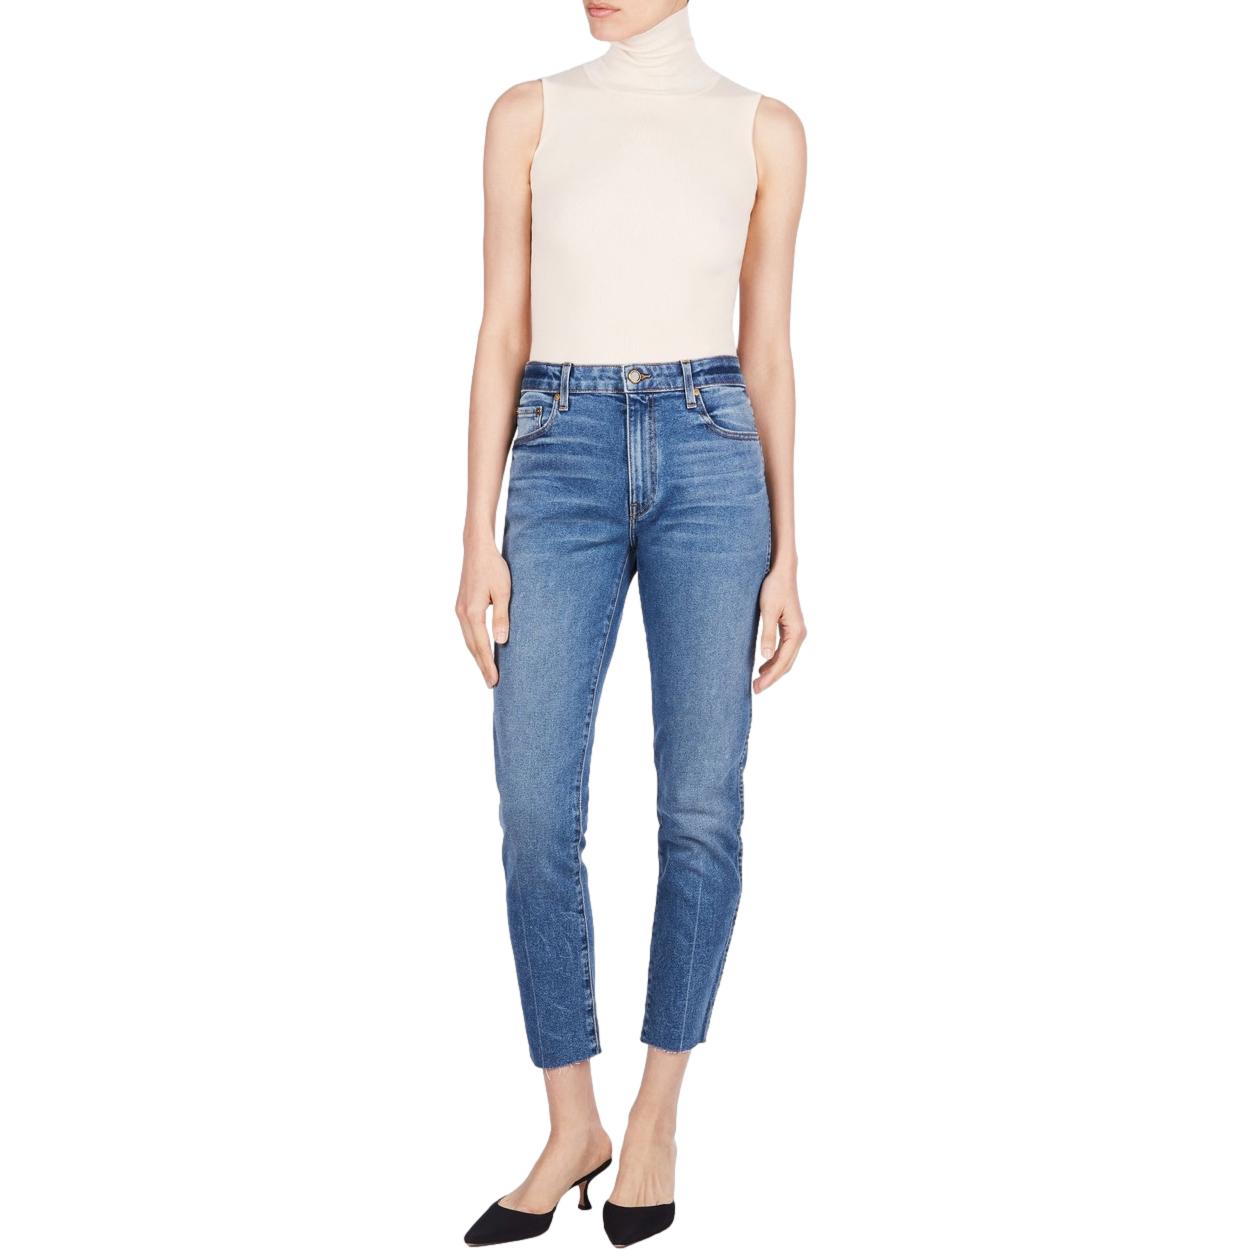 Khaite Blue Denim Alissa Jeans